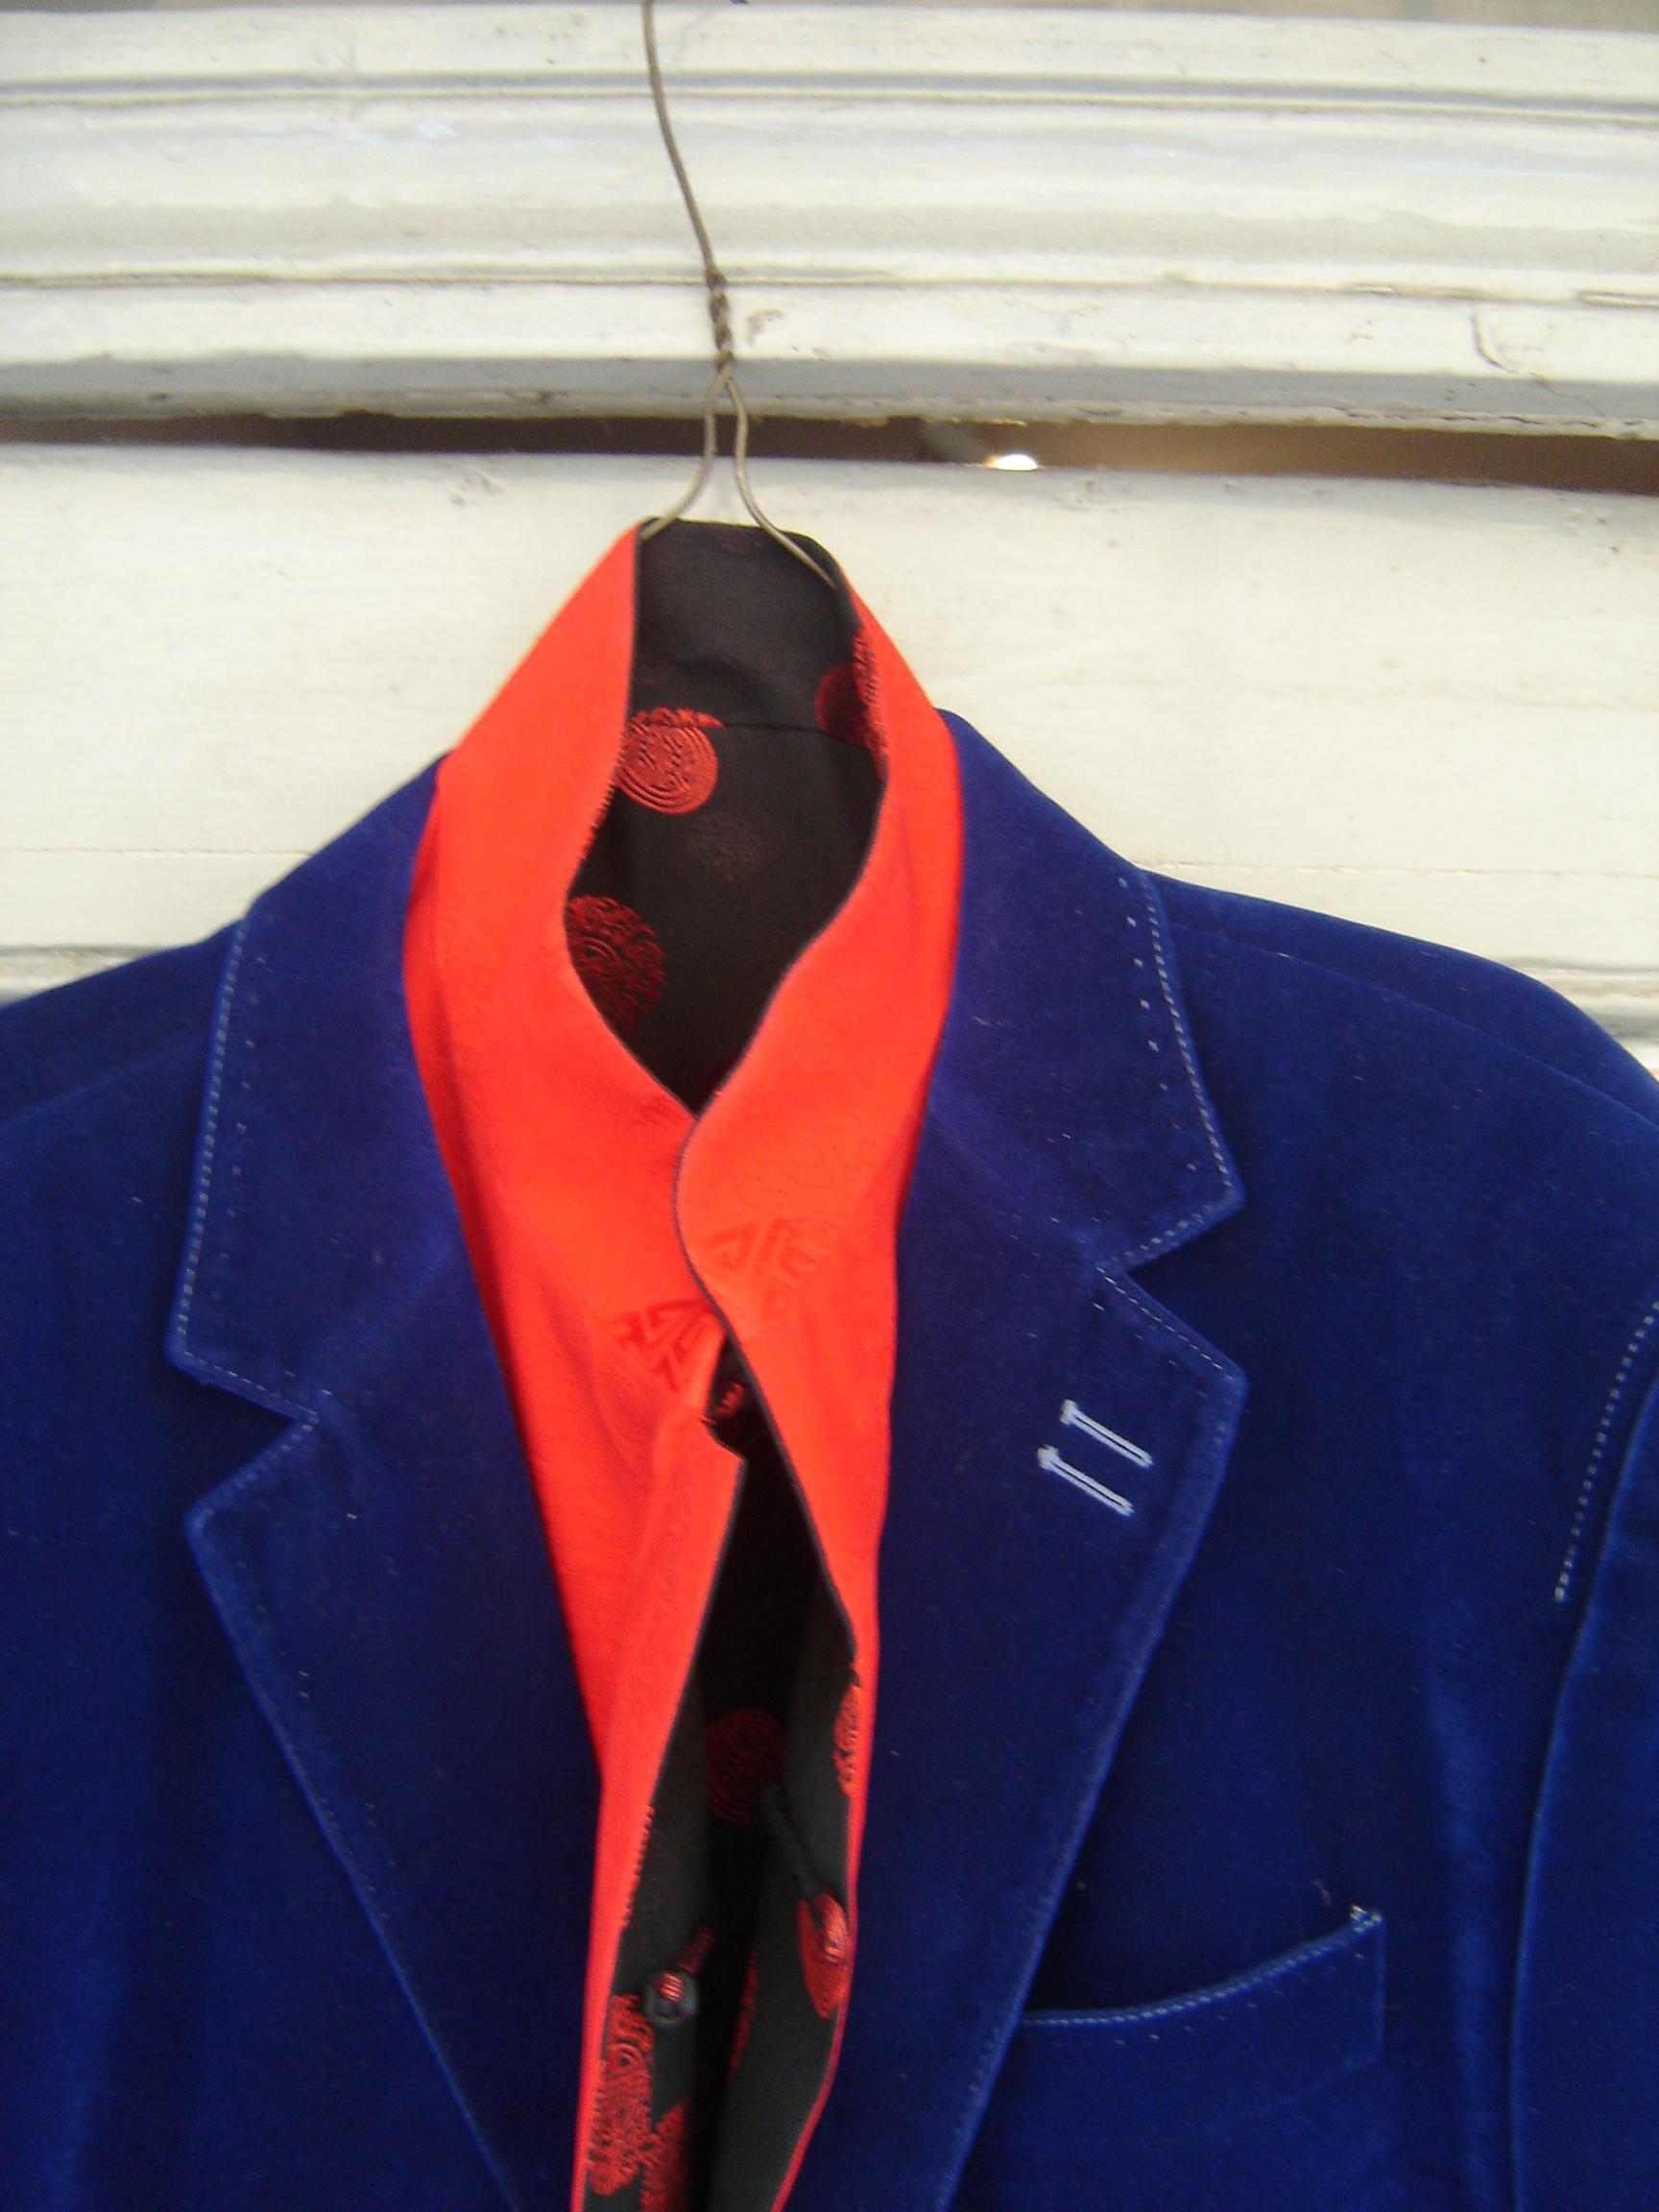 Falabella indigo velvet jacket, from Unicorn, 5 Ship Street, Oxford